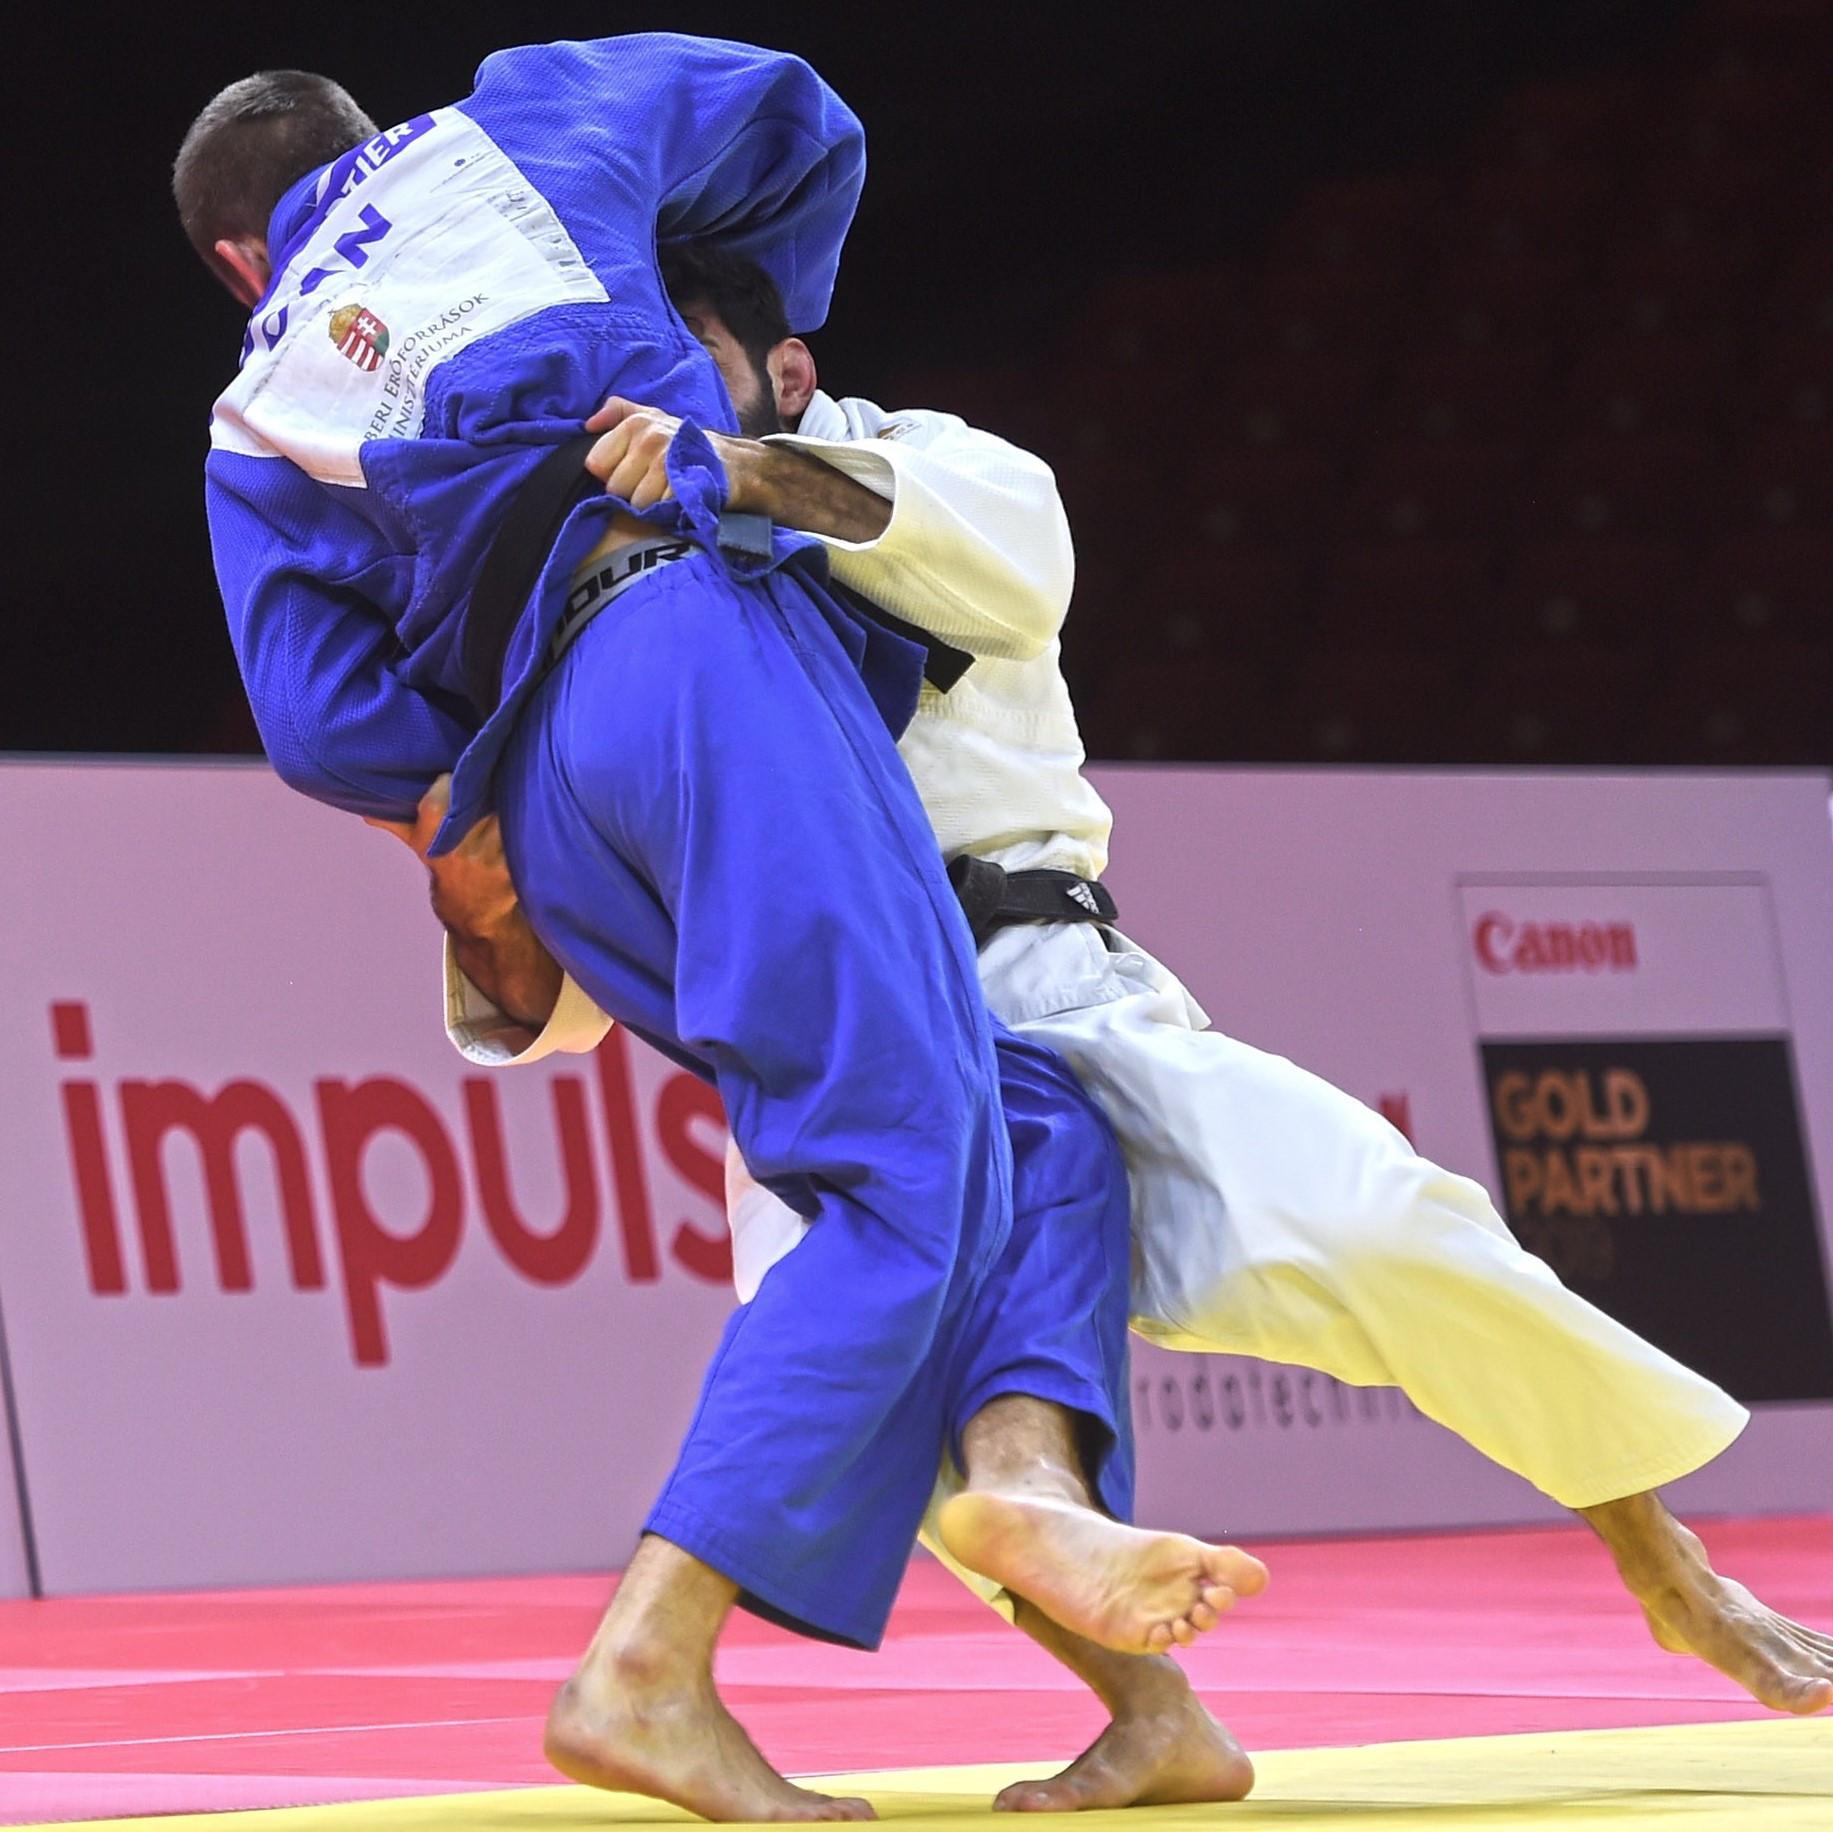 Matić knocks out world champion Gahié en route to Budapest Grand Slam title